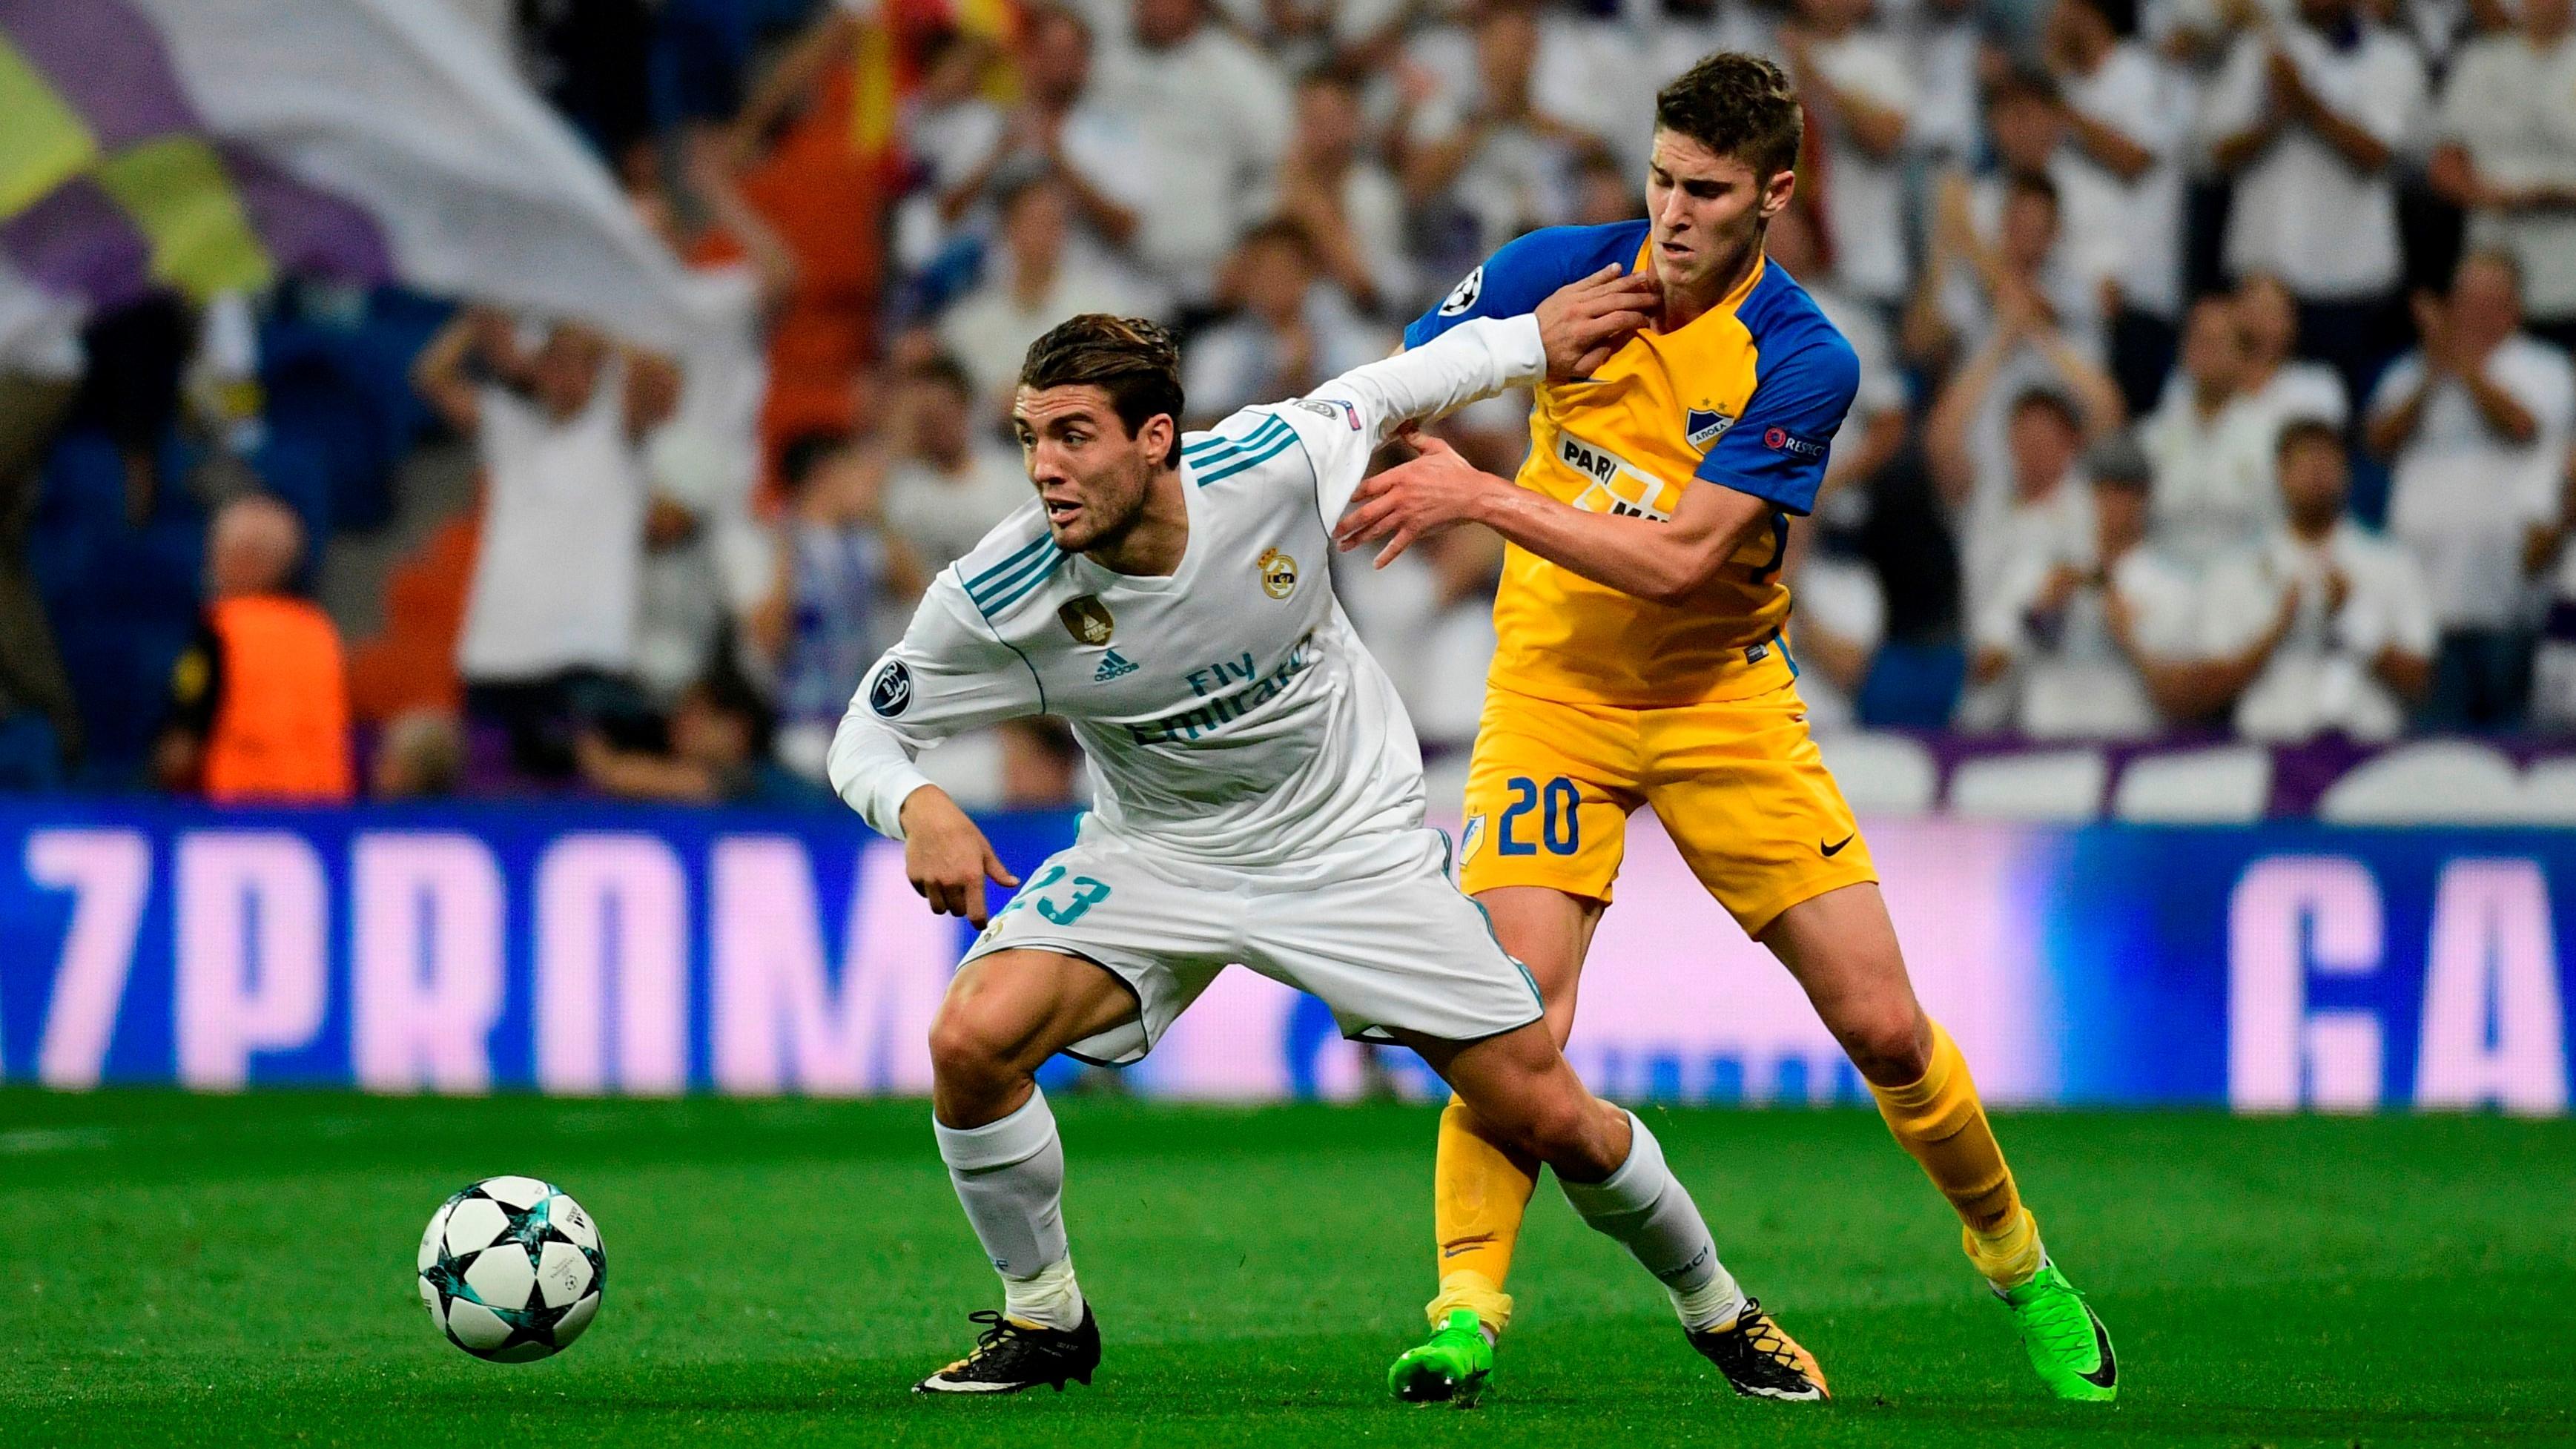 Mateo Kovacic Roland Sallai Real Madrid APOEL Champions League 13092017